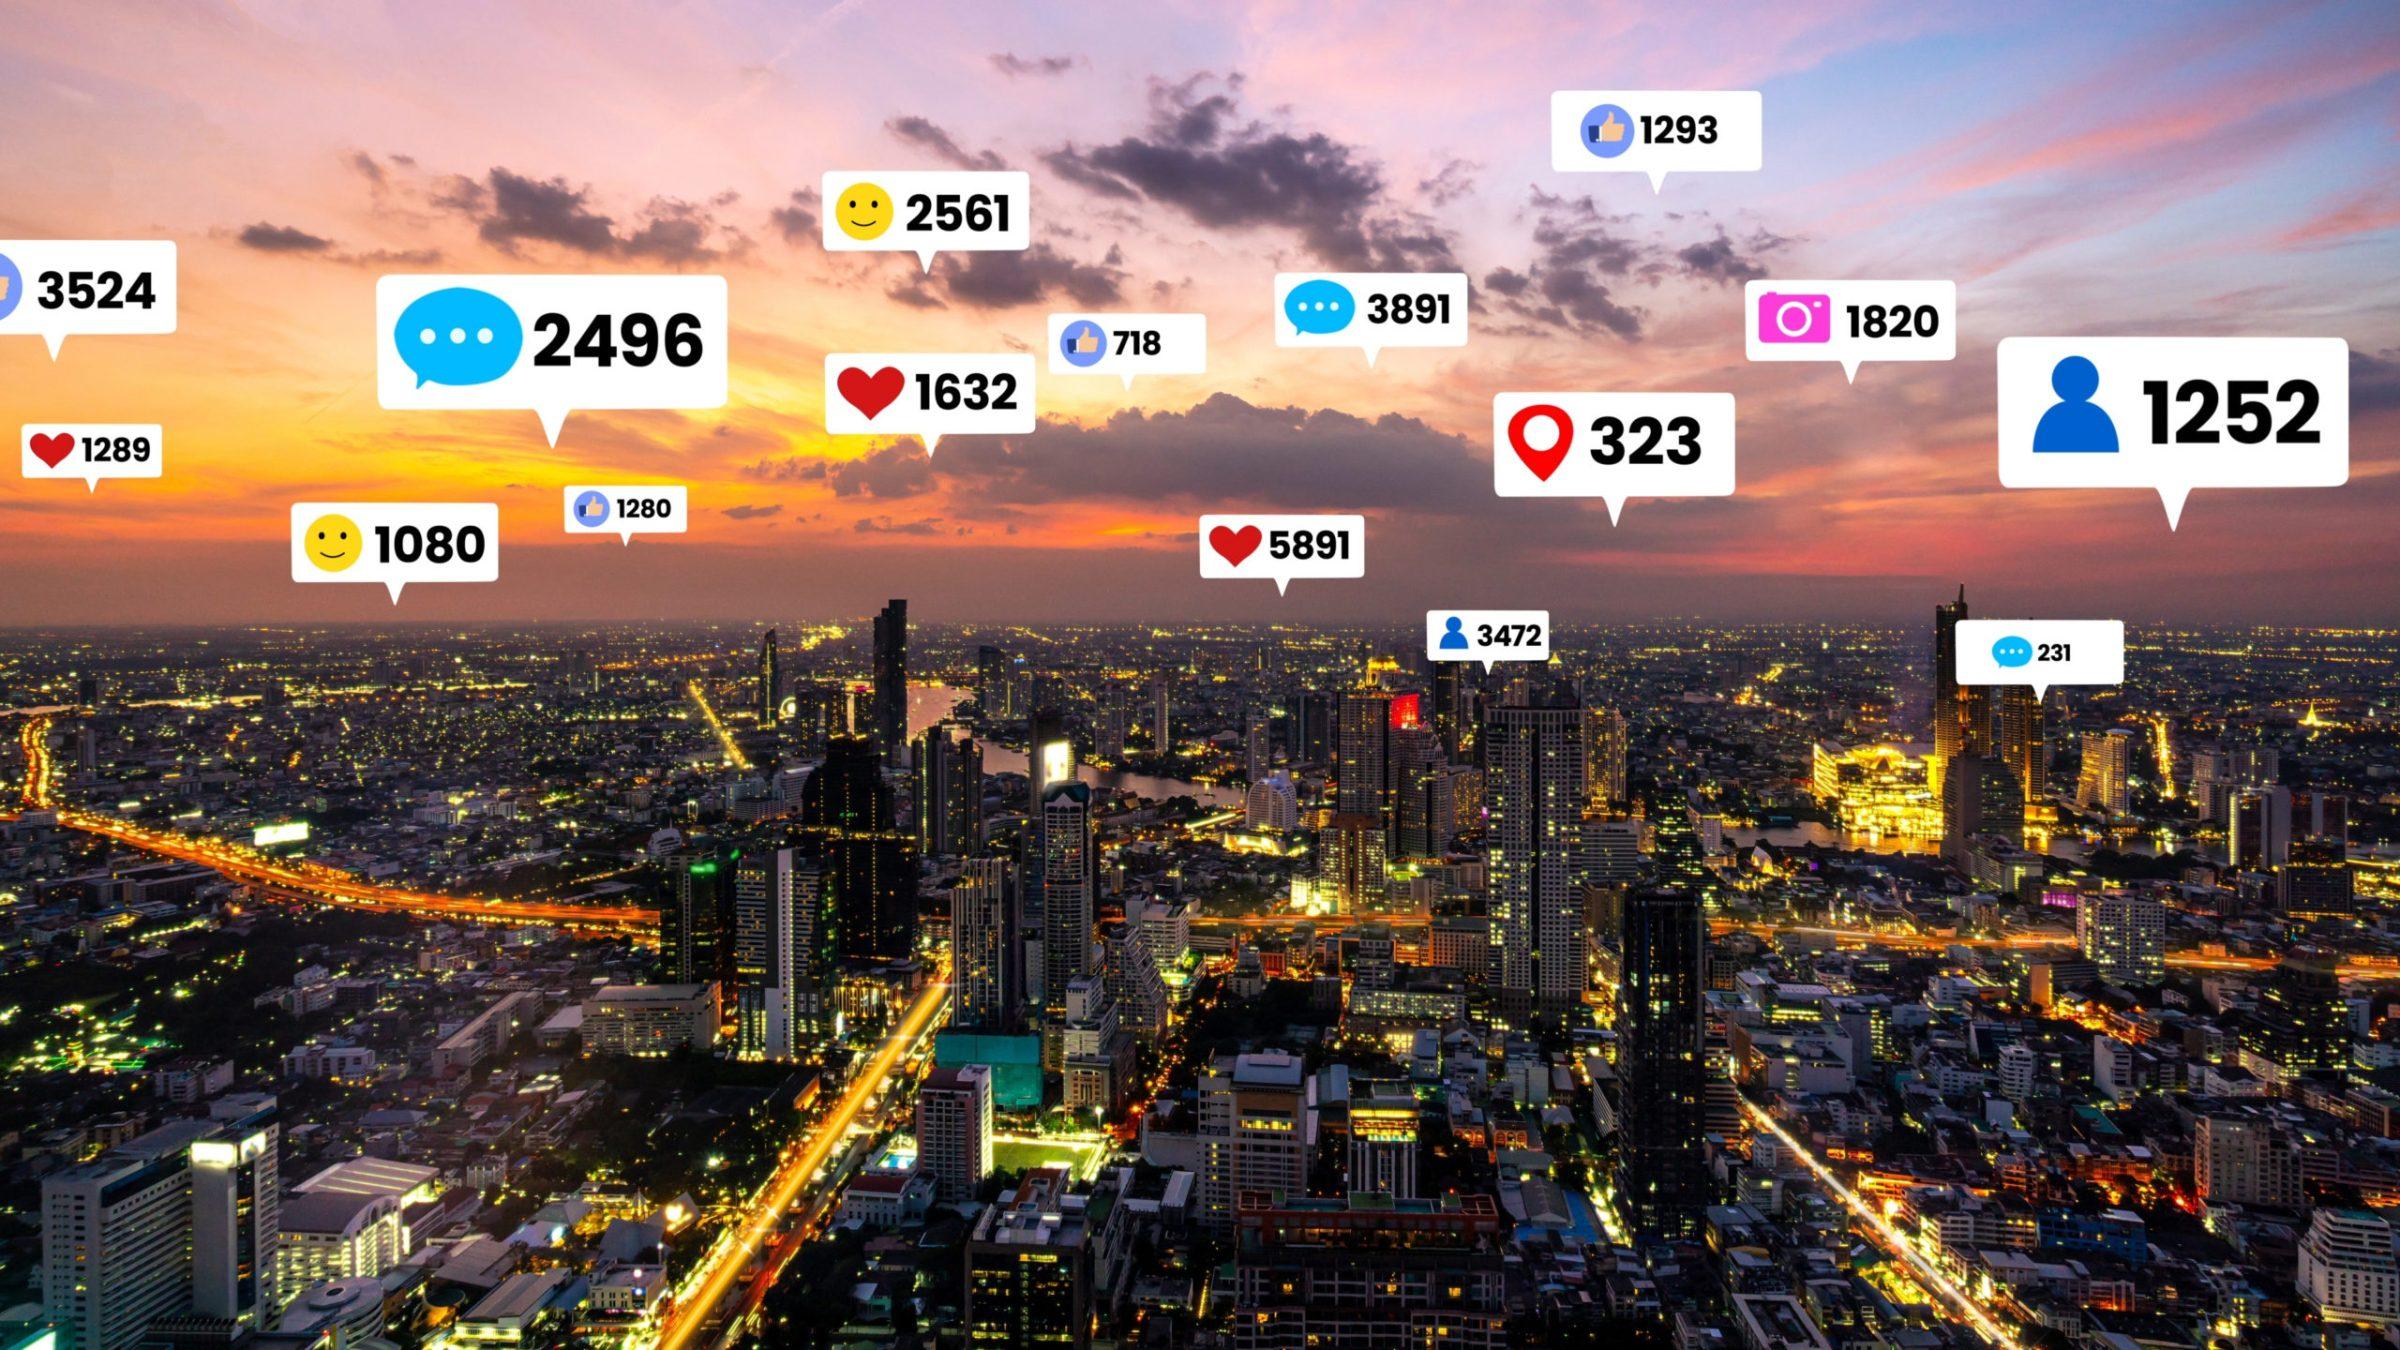 emgblog - increasing social media engagement